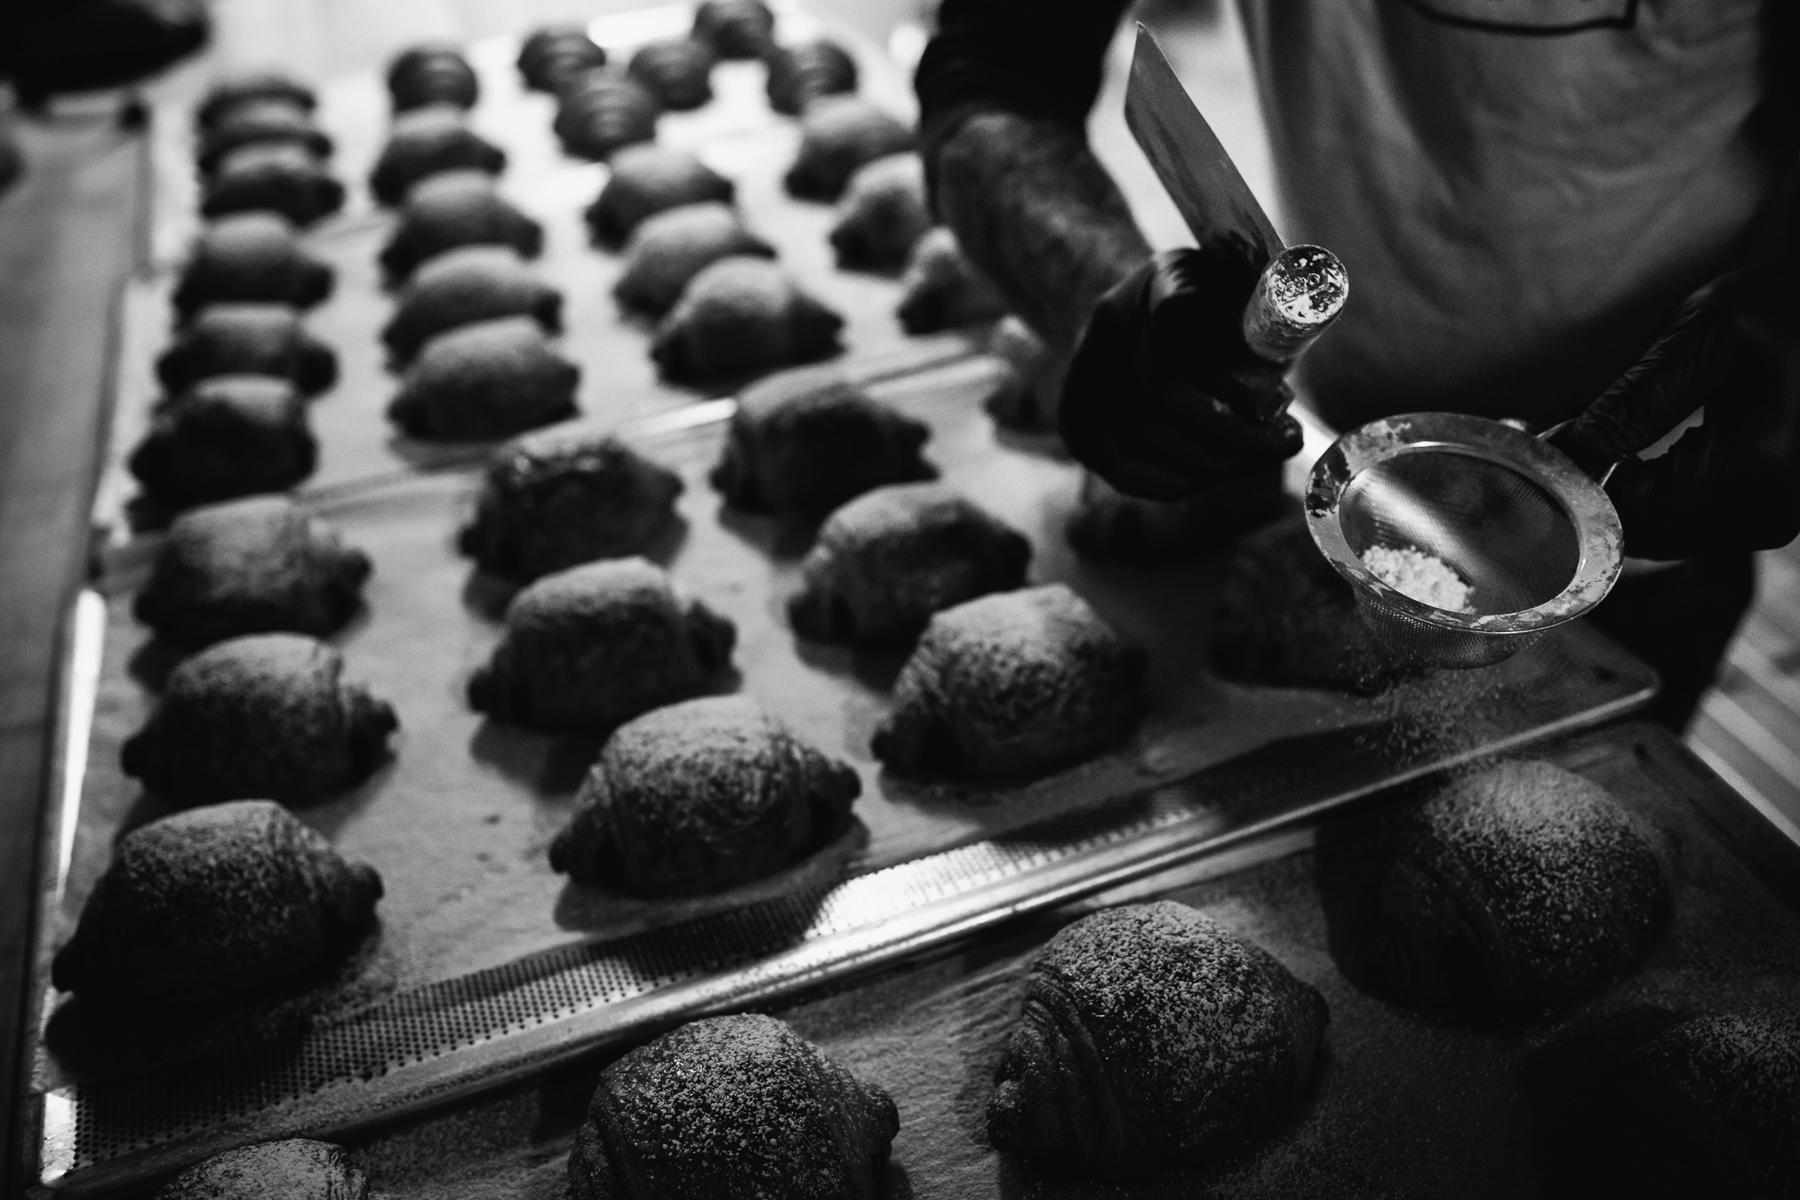 matt-tinder-saboteur-bakery-bremerton-wa-34